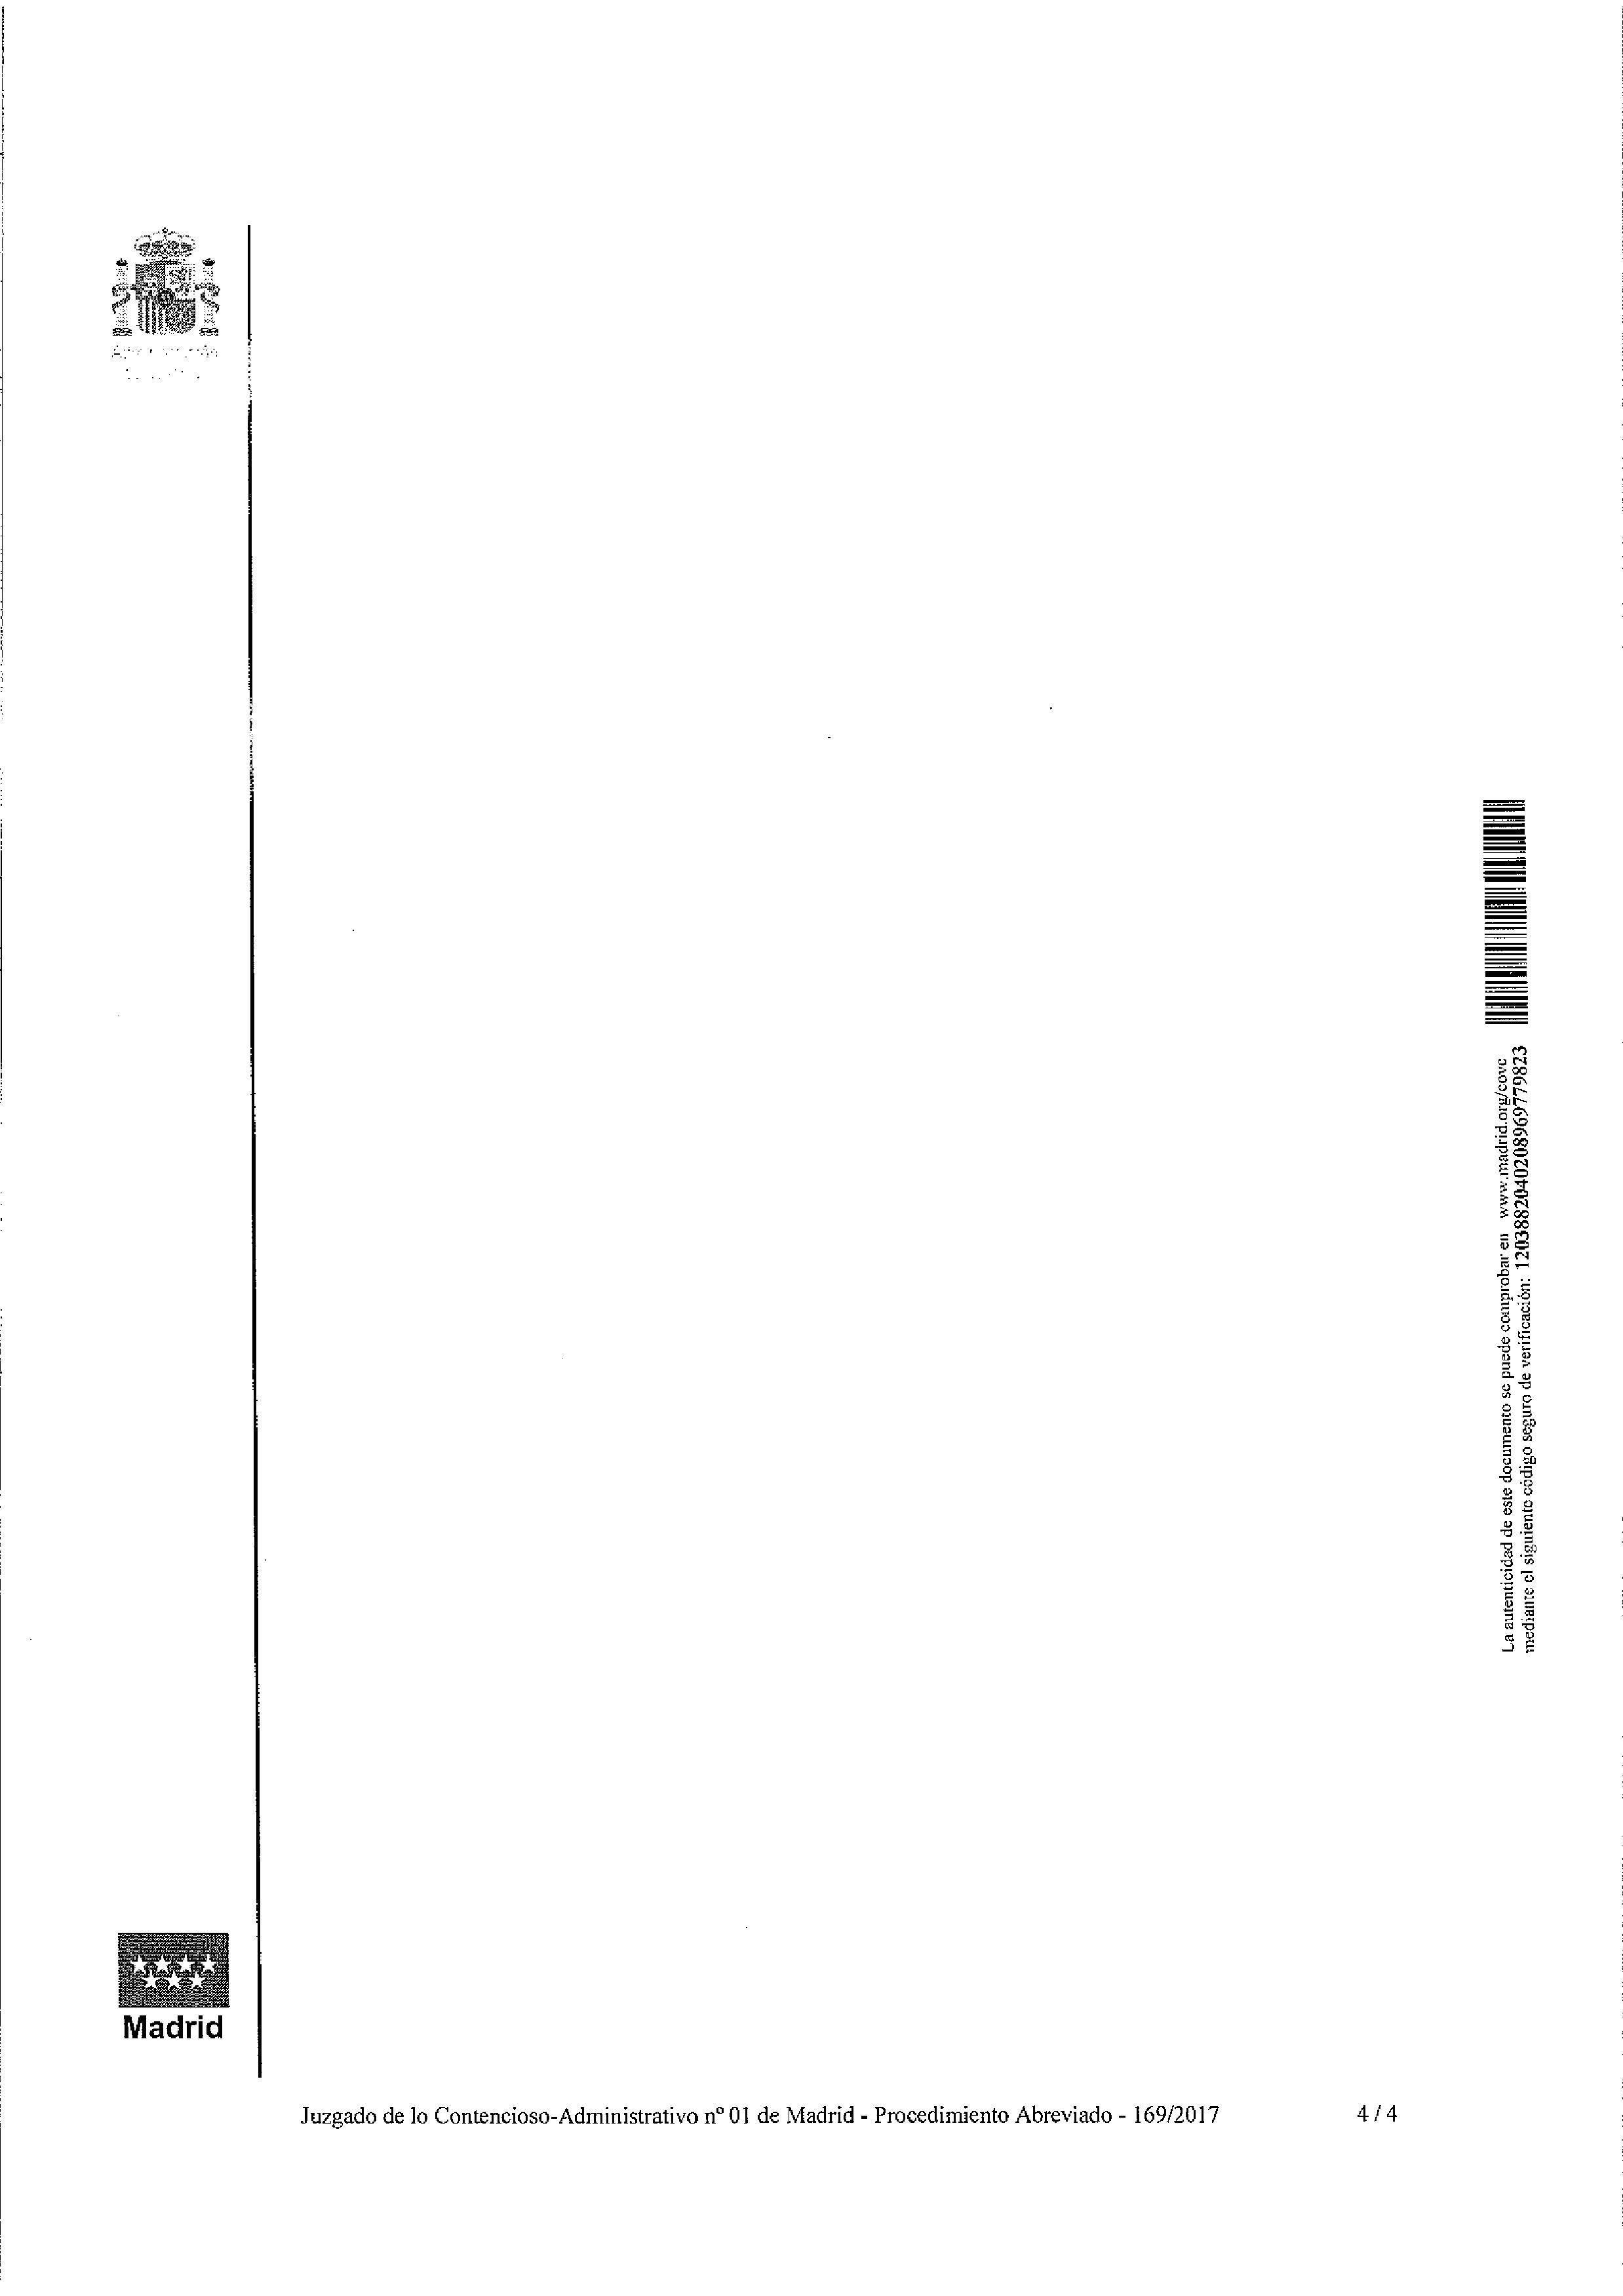 SENTENCIA-ZONA-APR-4